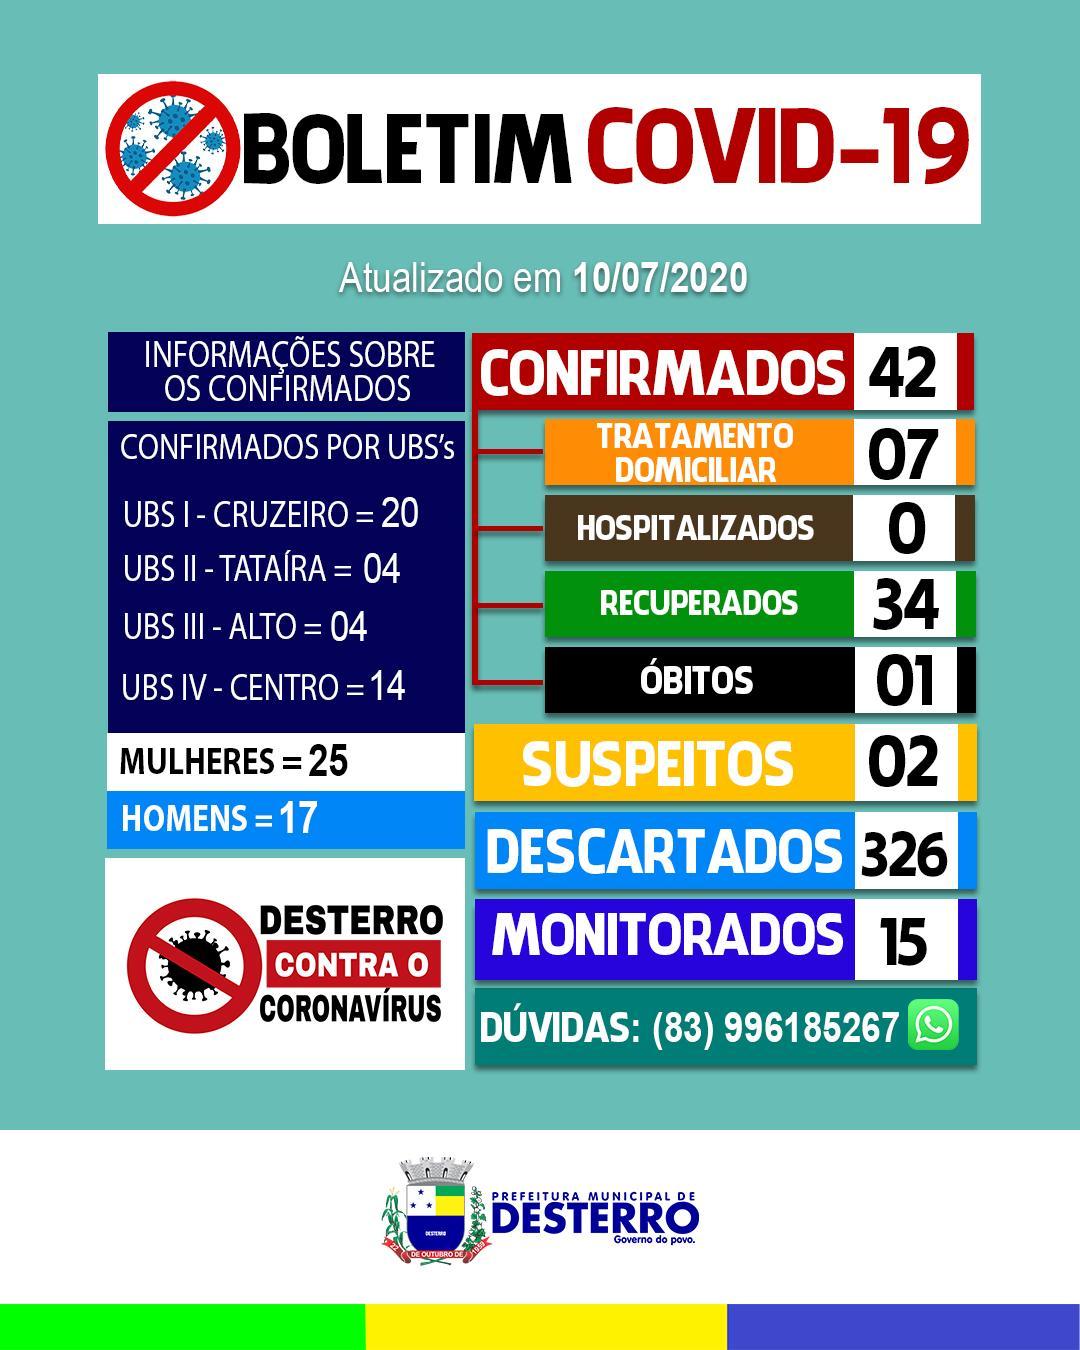 Boletim Covid-19 (10/07/2020)